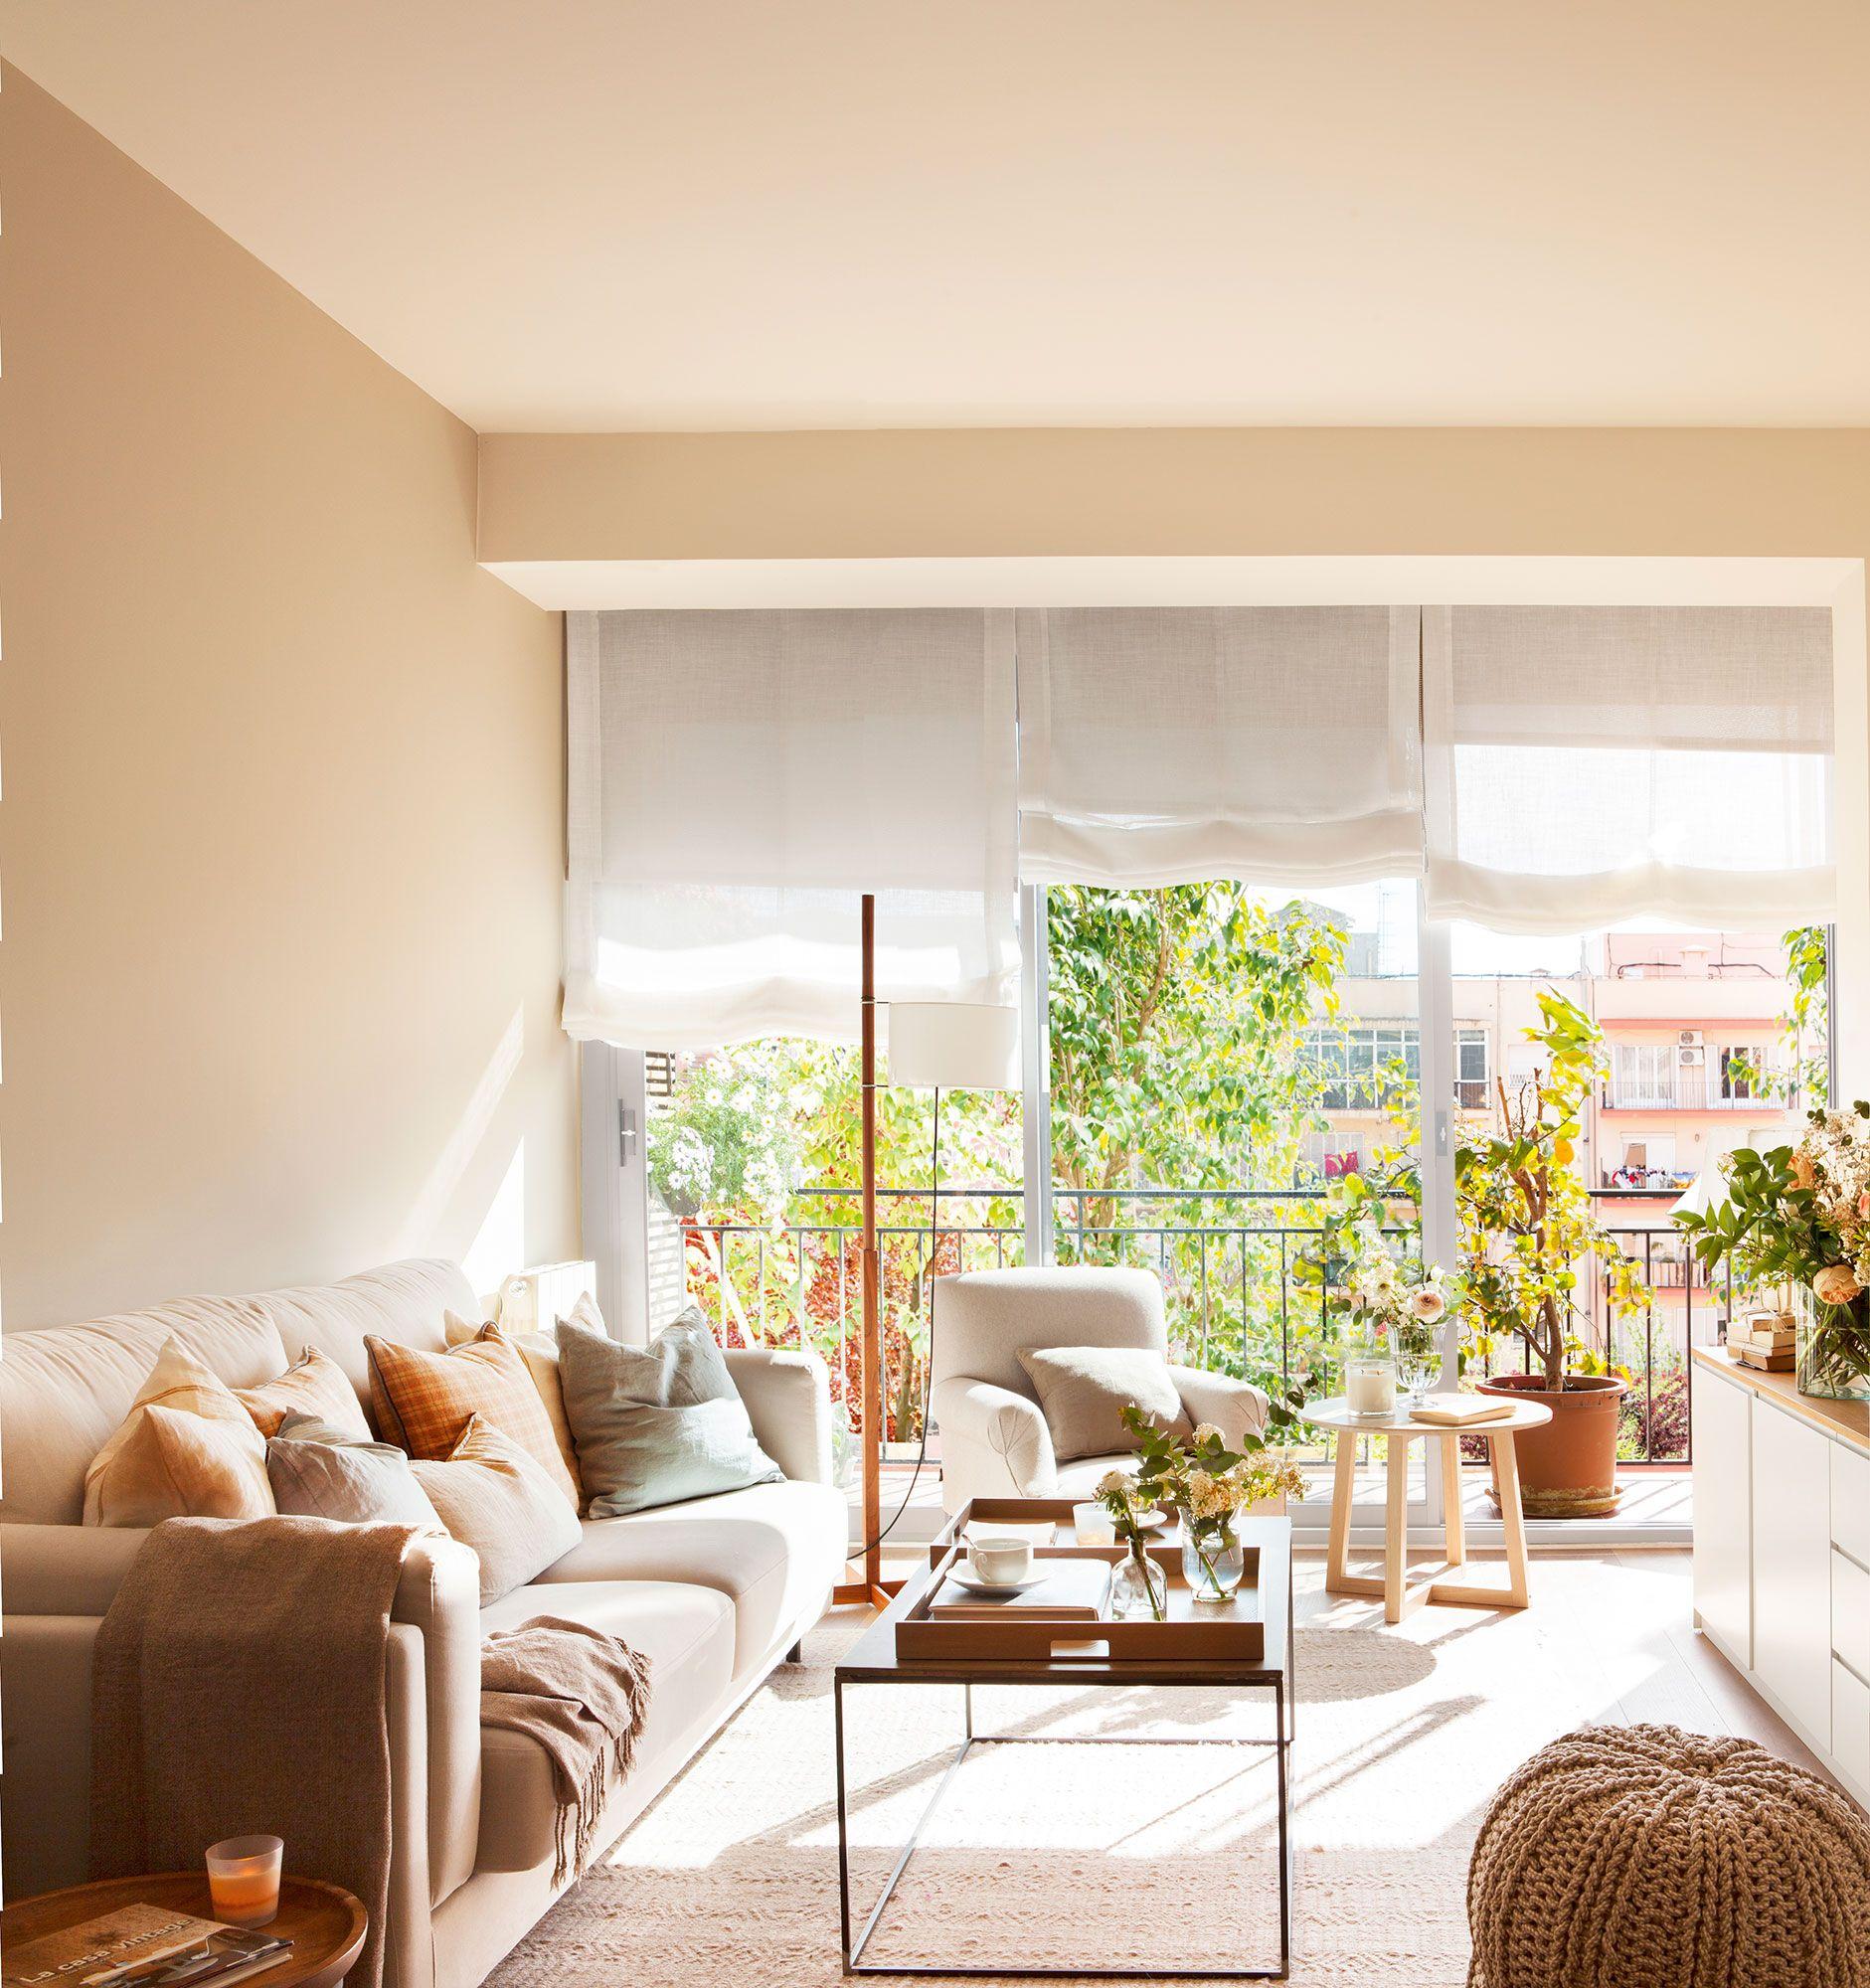 Sal n con gran ventanal sof arrimado a la pared butaca for Salones para pisos